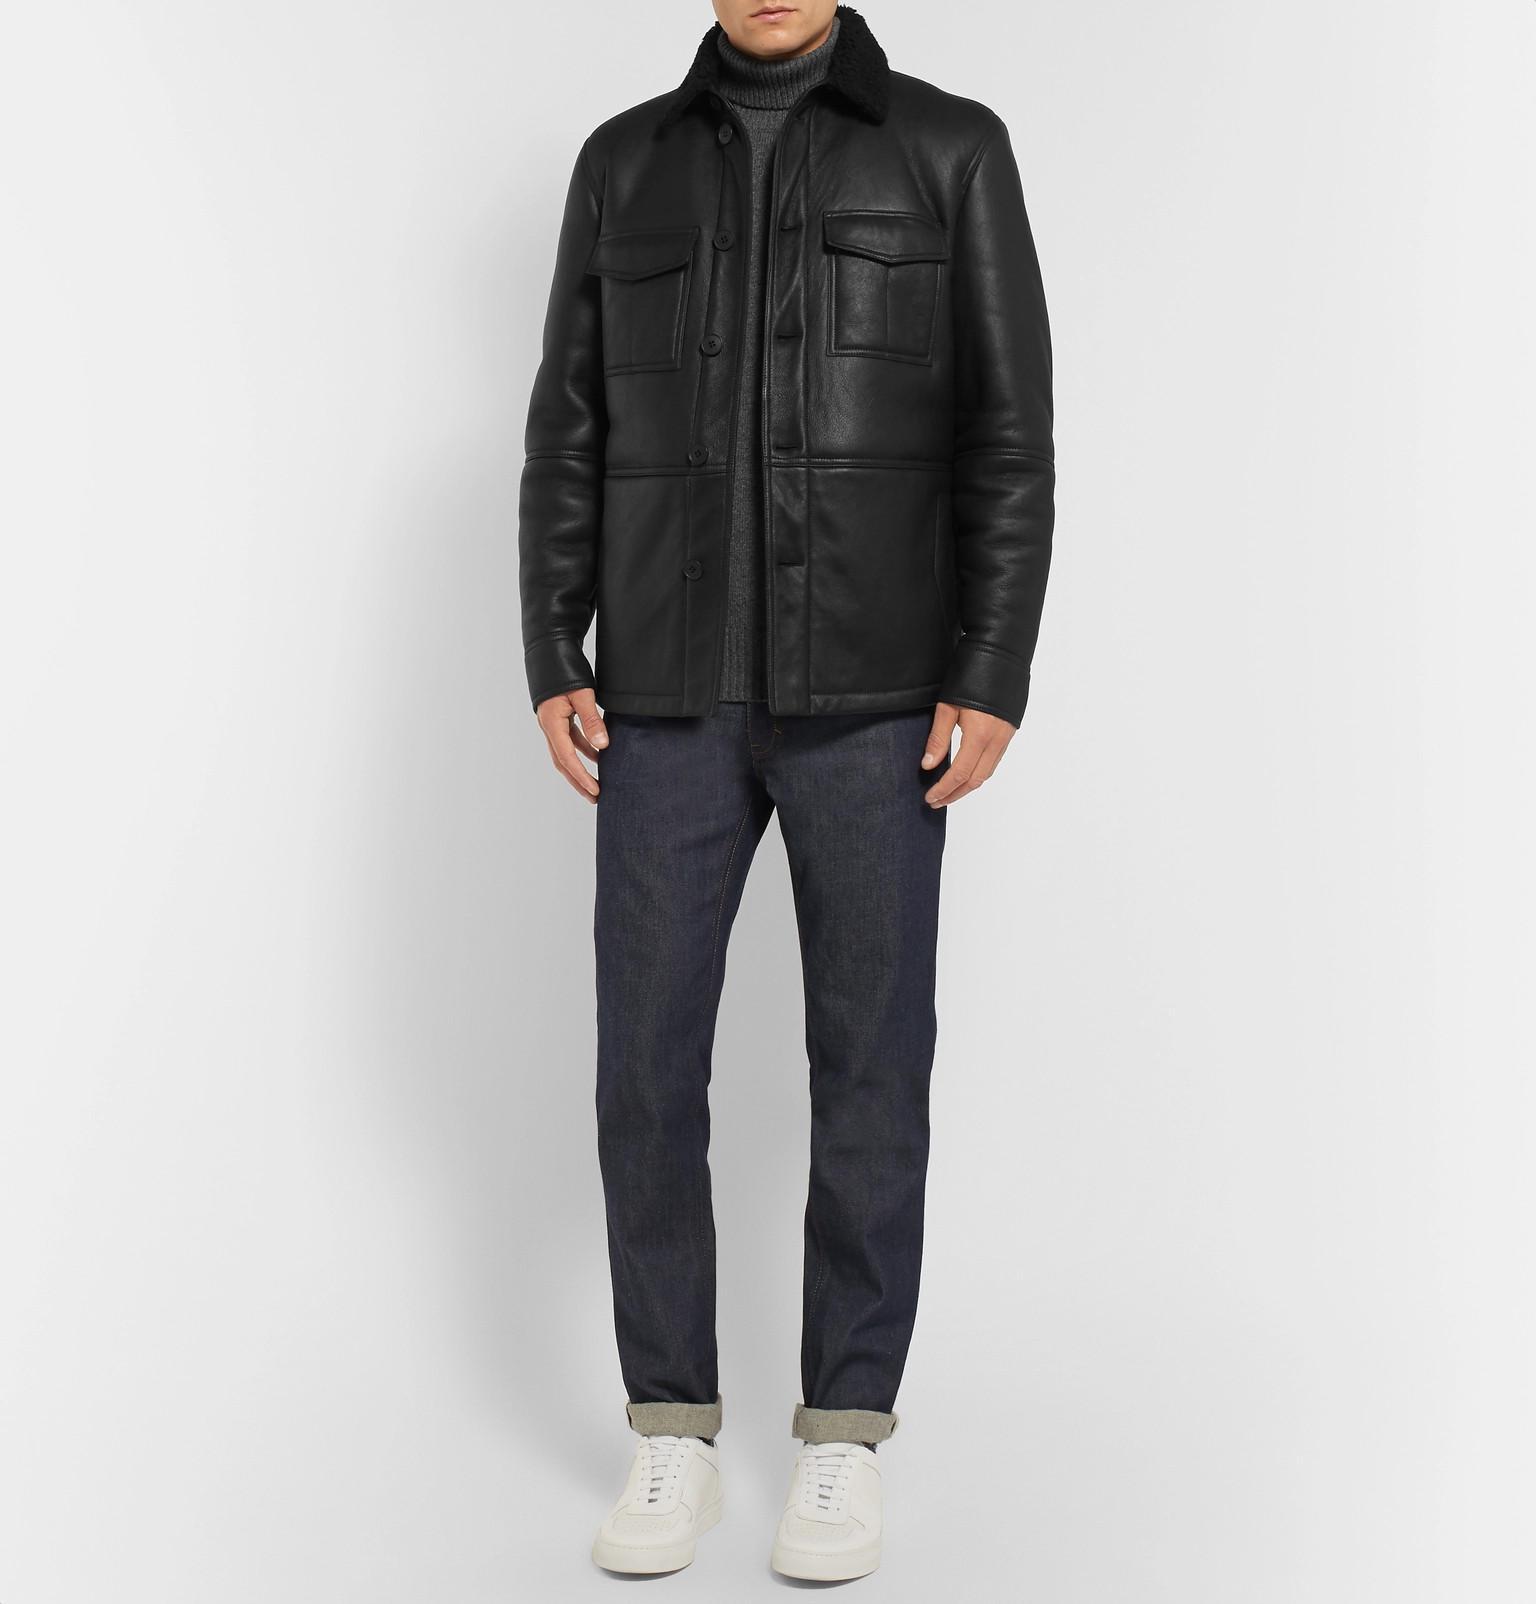 Tomas Maier Denim Shearling Jacket in Black for Men